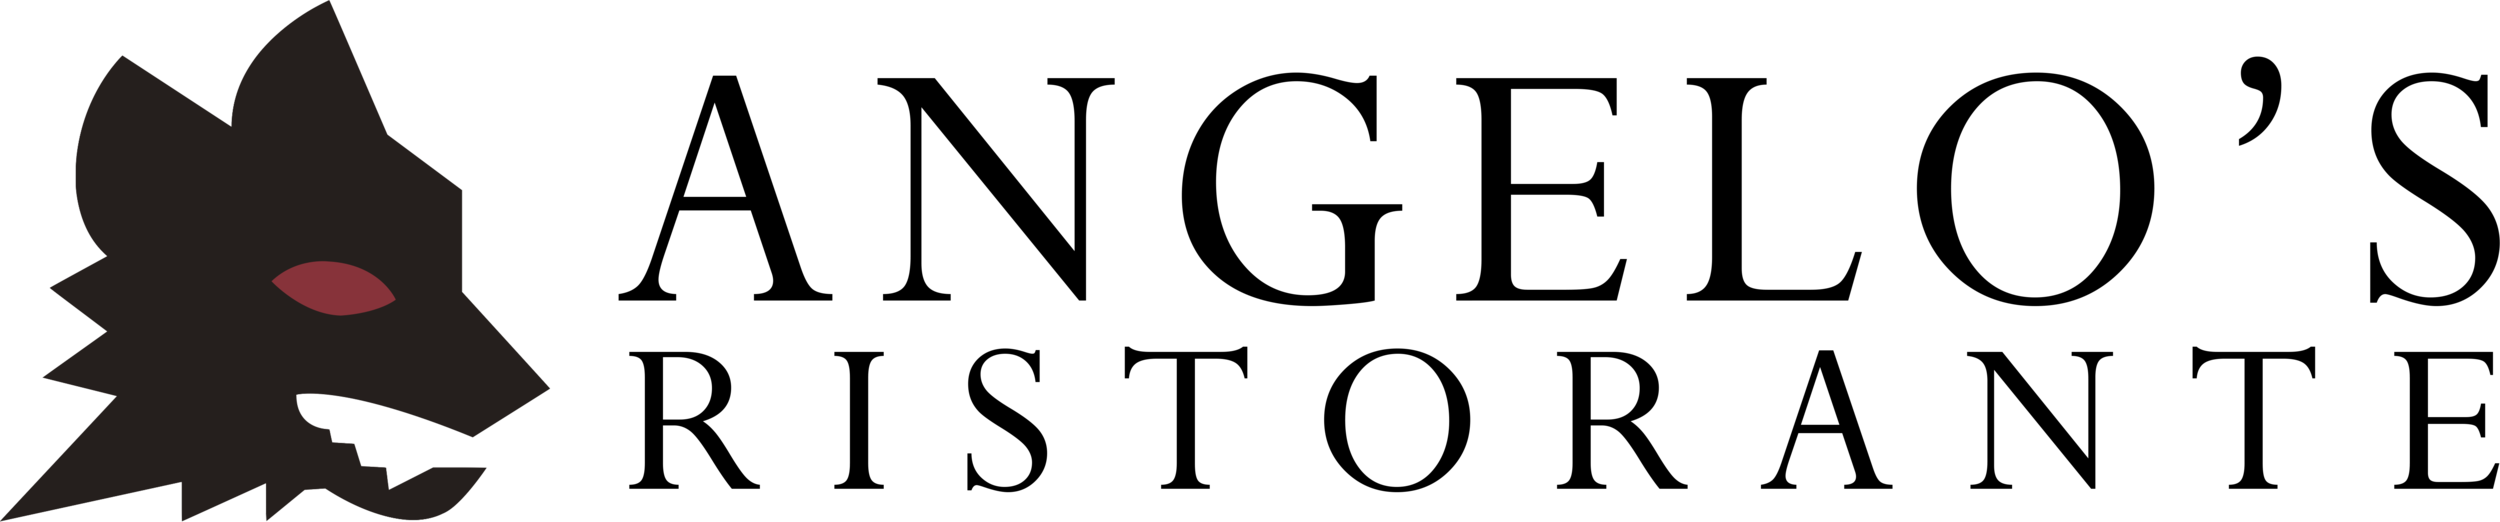 Angelo's of Bellevue—Logo Mock Up.png